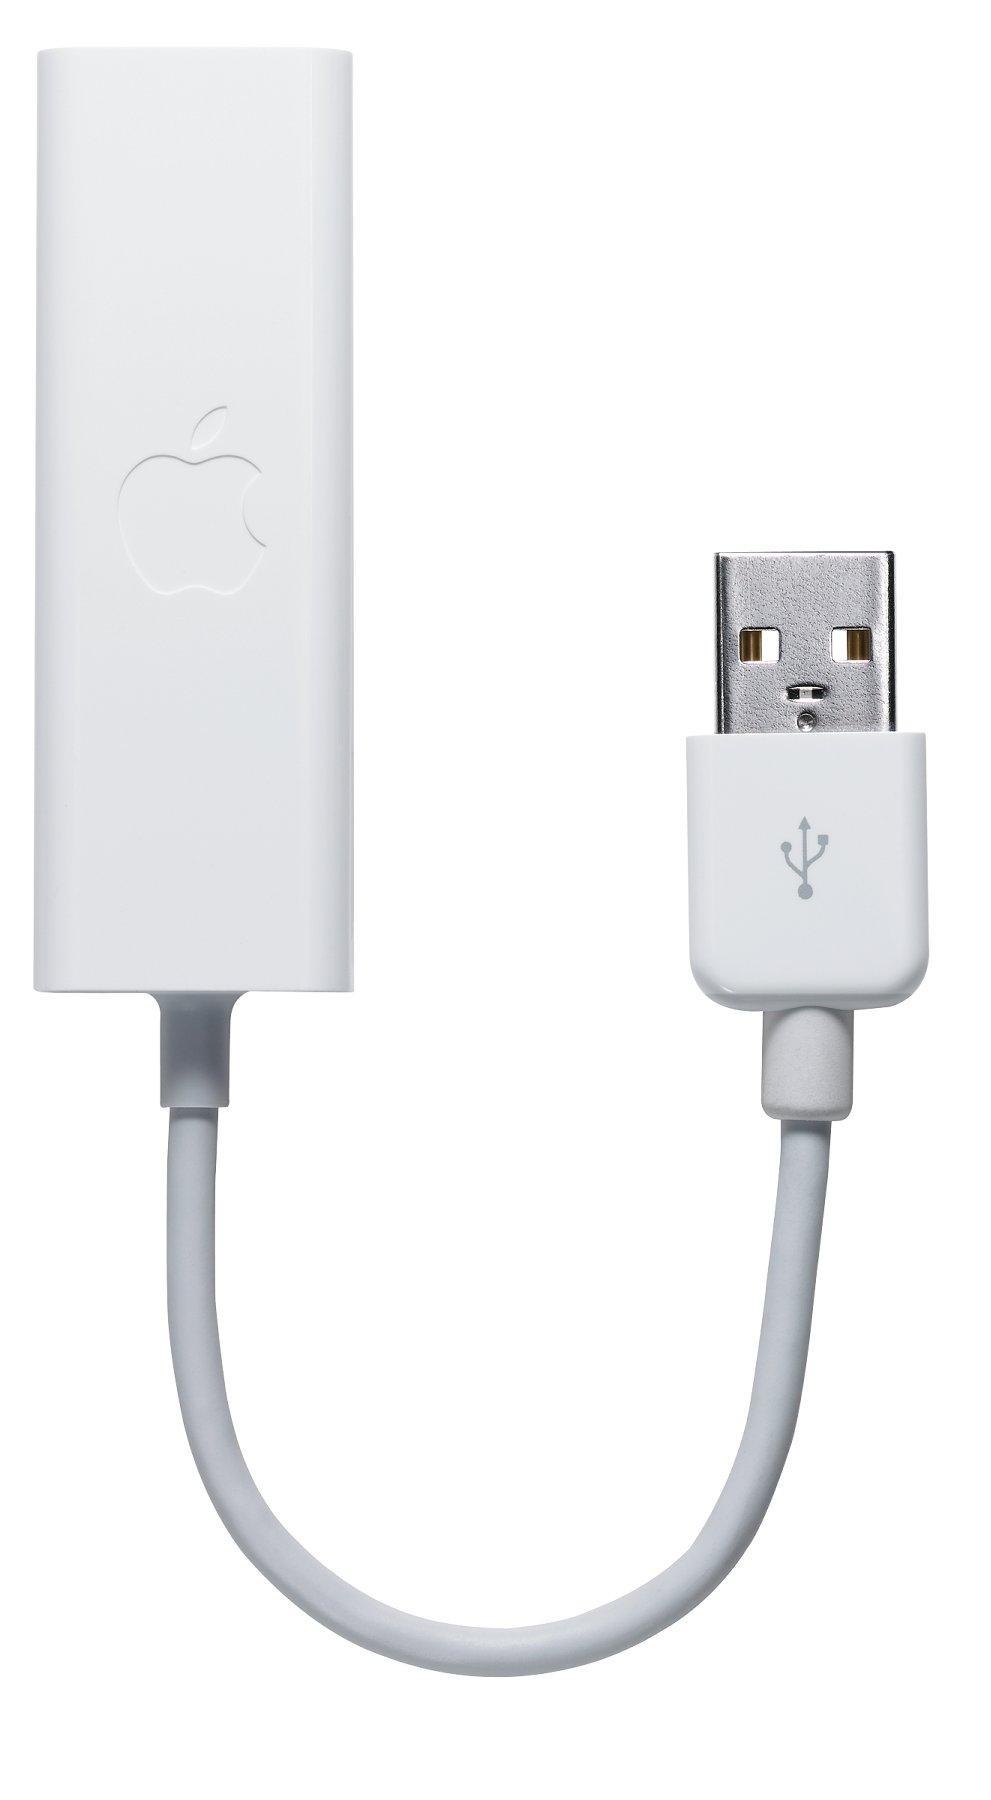 Apple USB Ethernet Adaptor